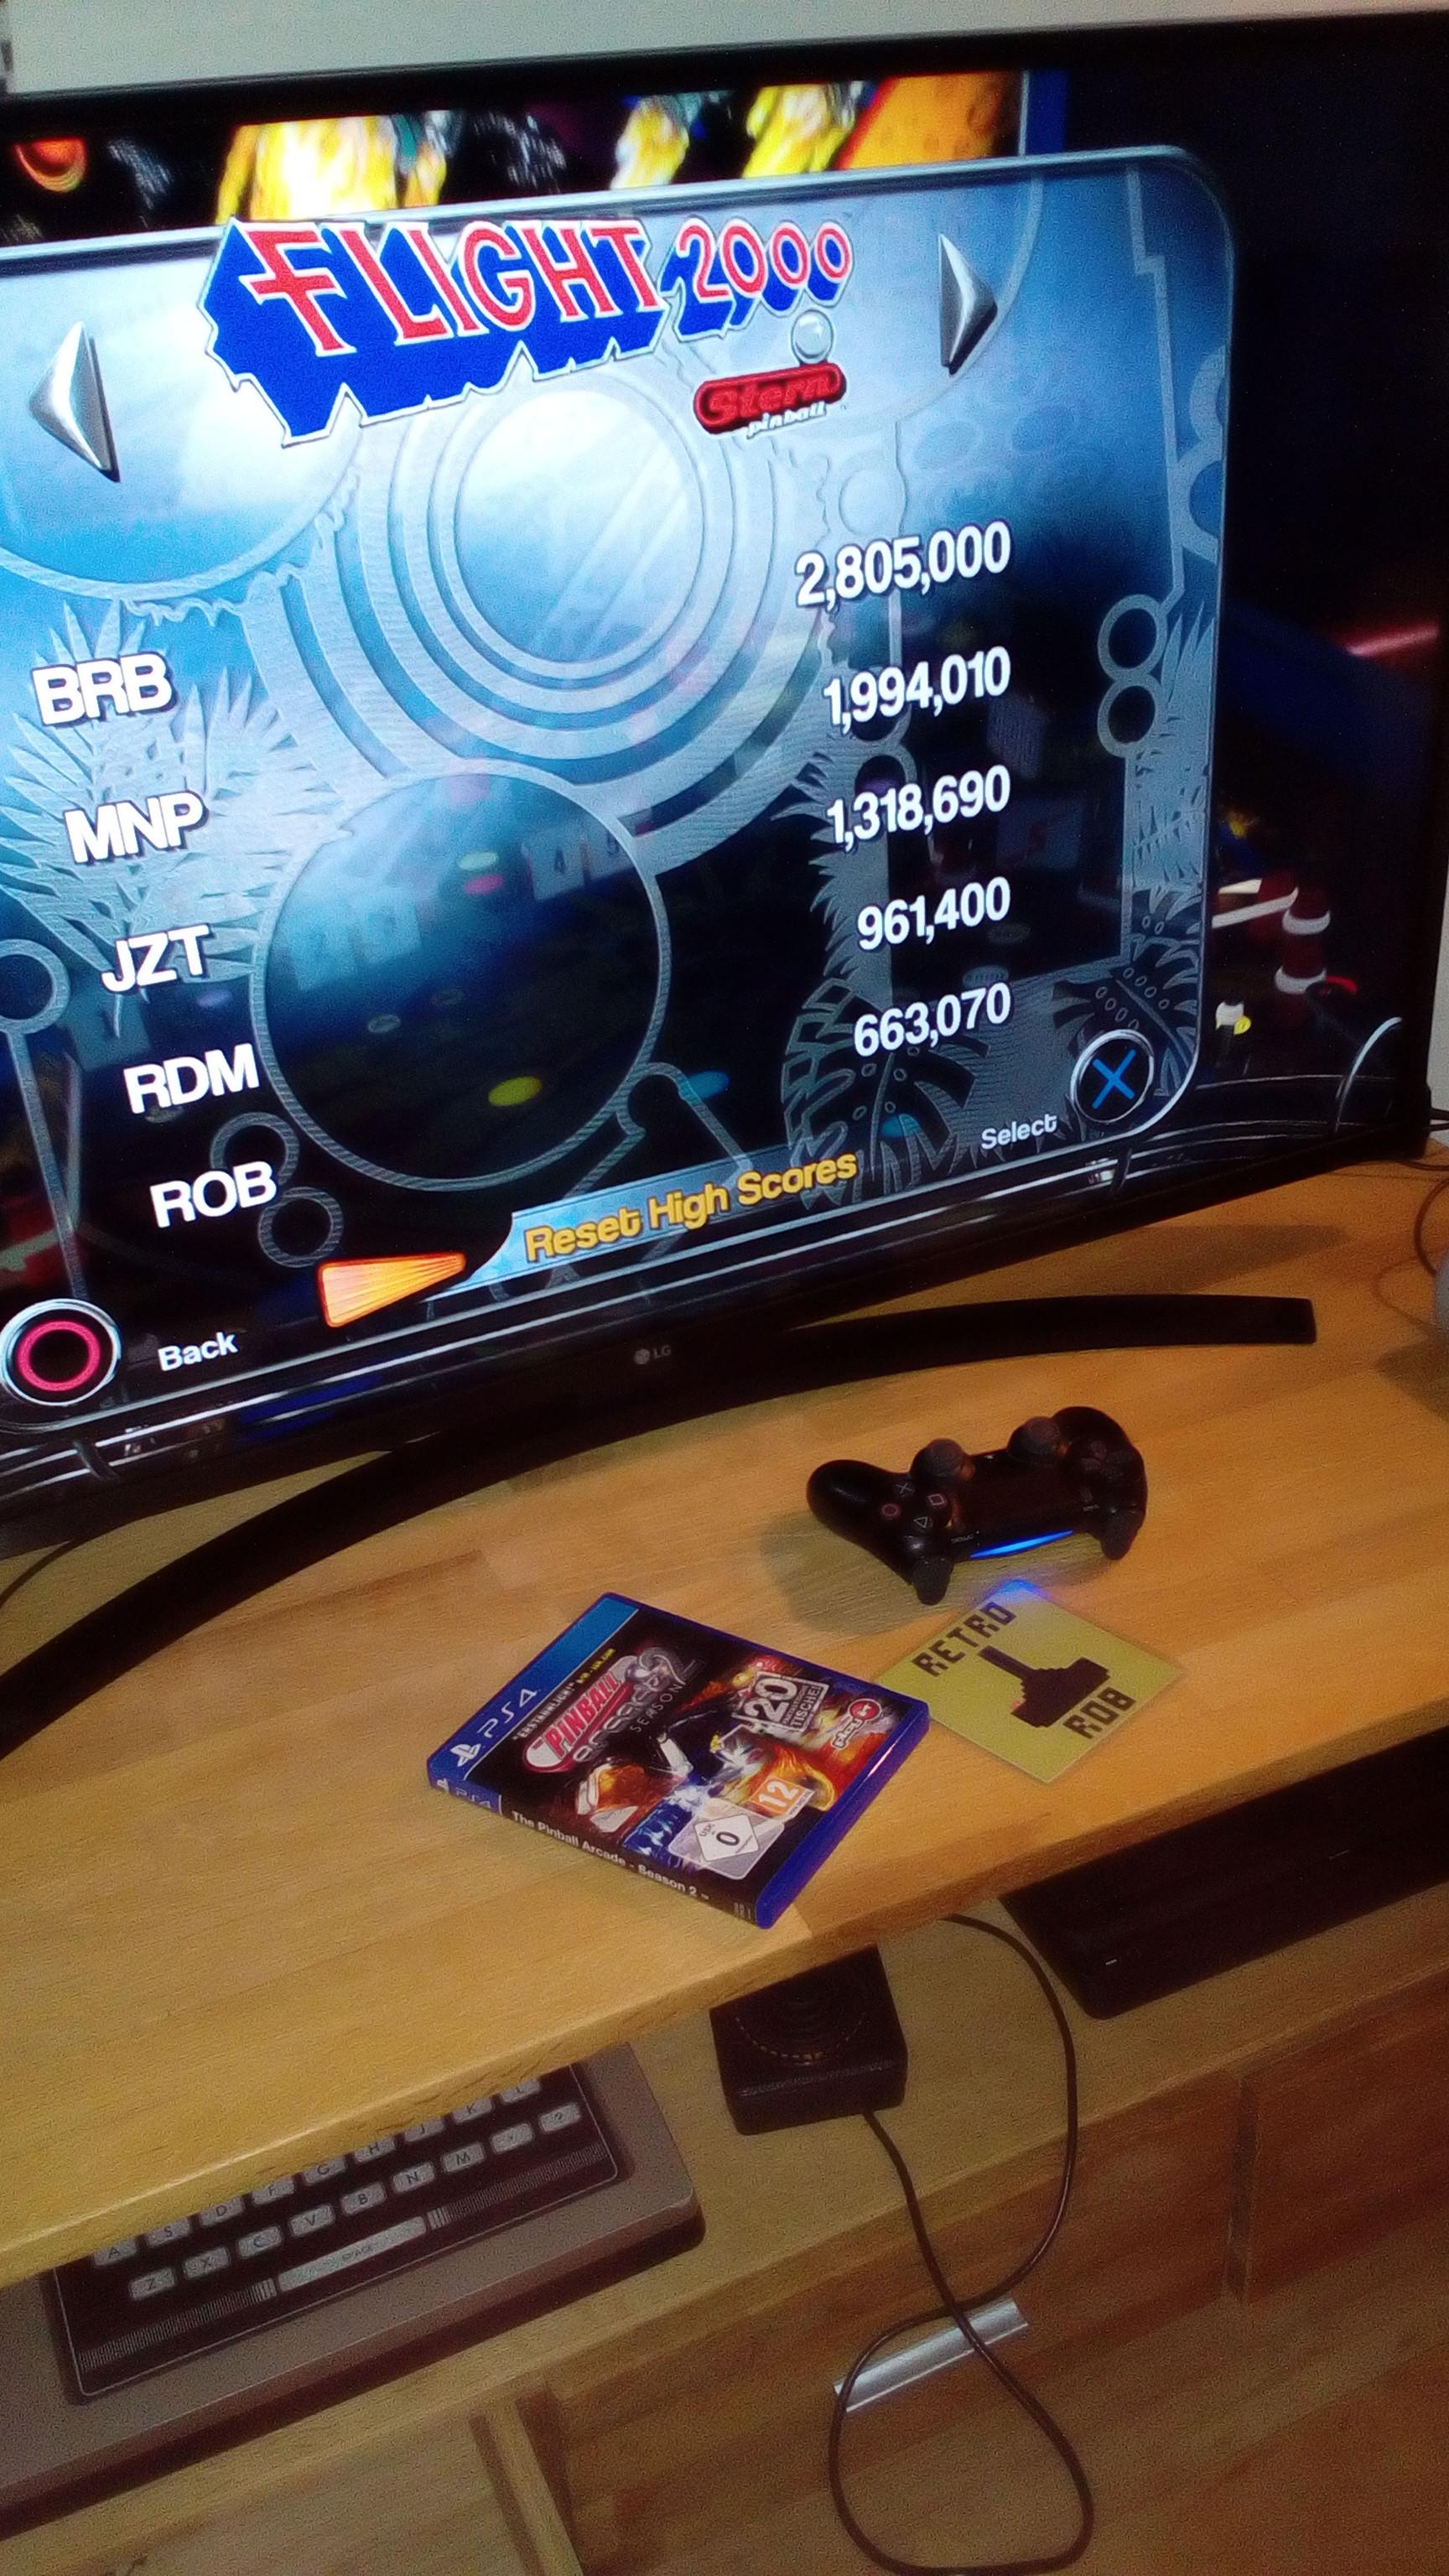 RetroRob: Pinball Arcade: Flight 2000 (Playstation 4) 663,070 points on 2020-07-17 01:13:50